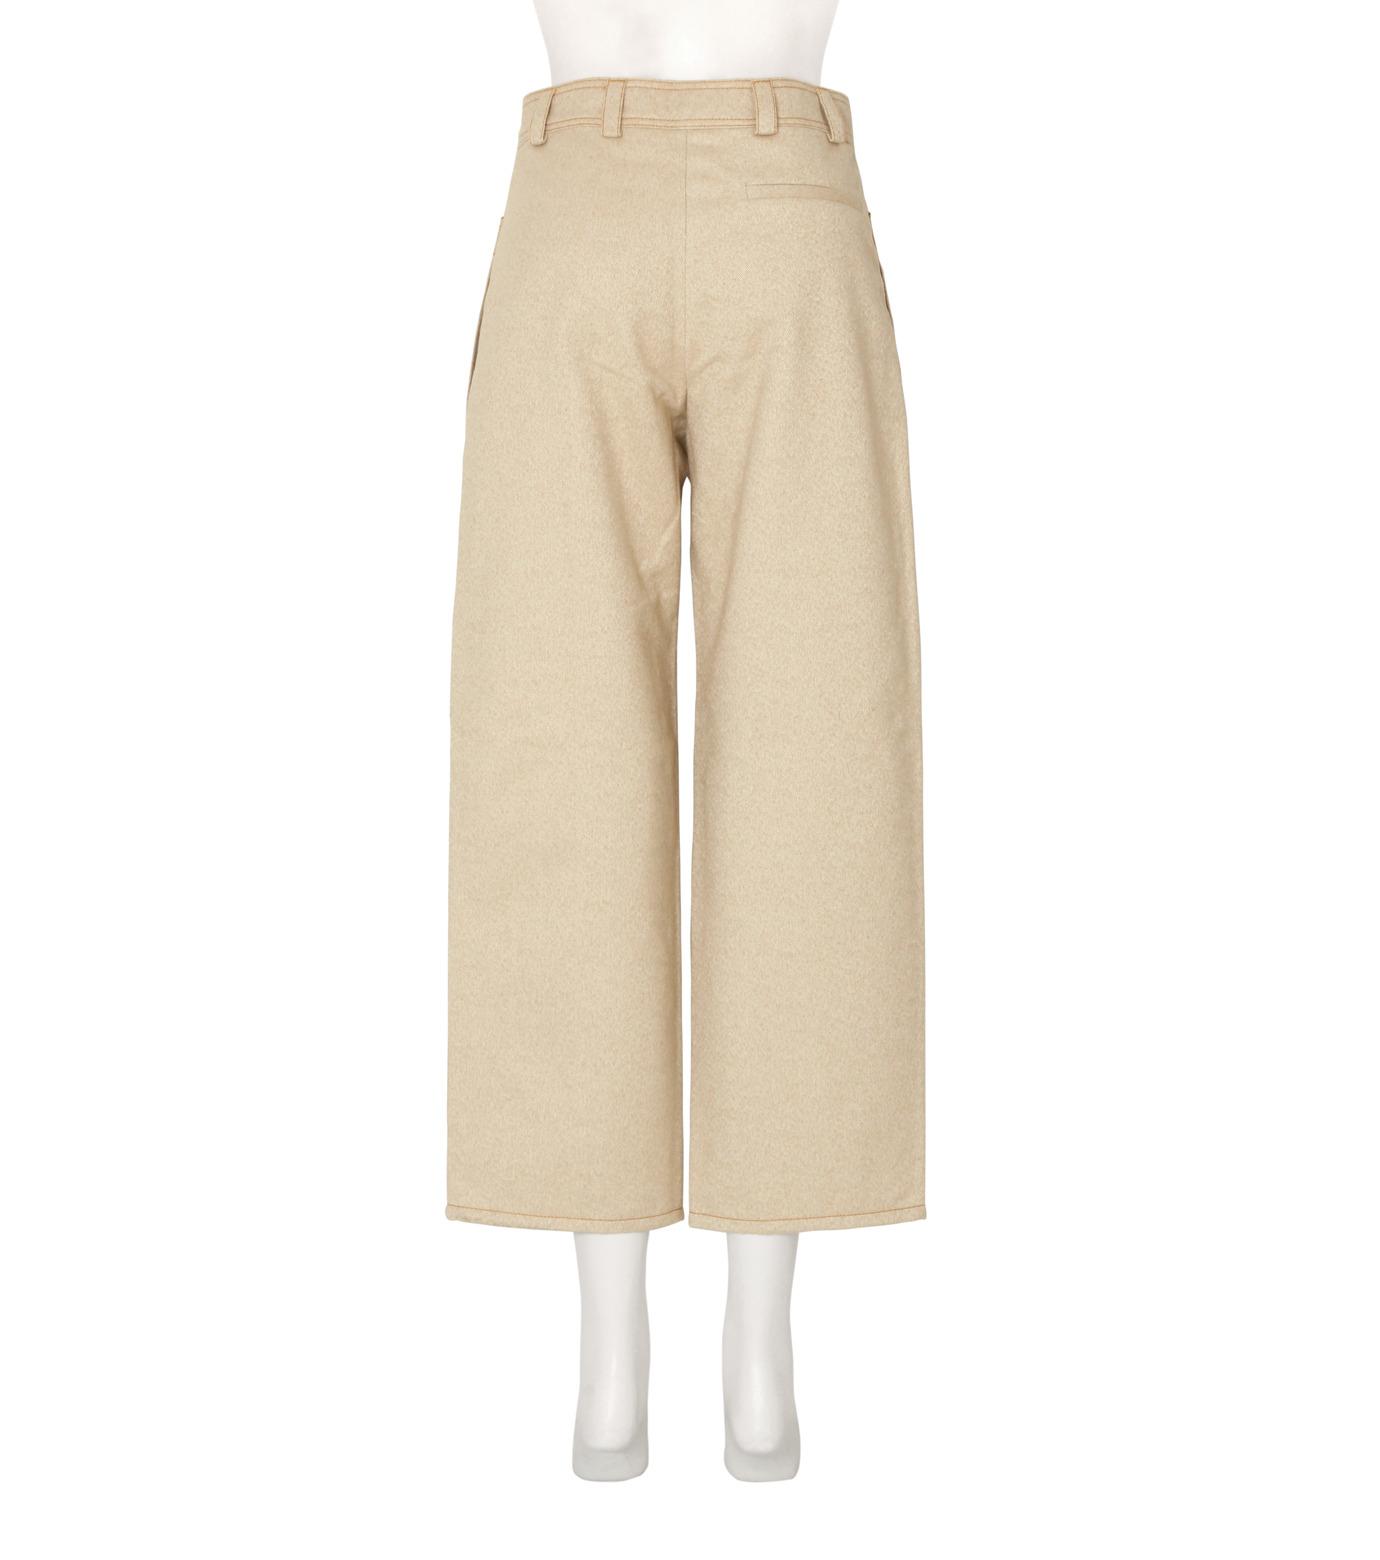 ACNE STUDIOS(アクネ ストゥディオズ)のCargo Pkt Cropped Wide Pants-LIGHT BEIGE(パンツ/pants)-10B163-51 拡大詳細画像2